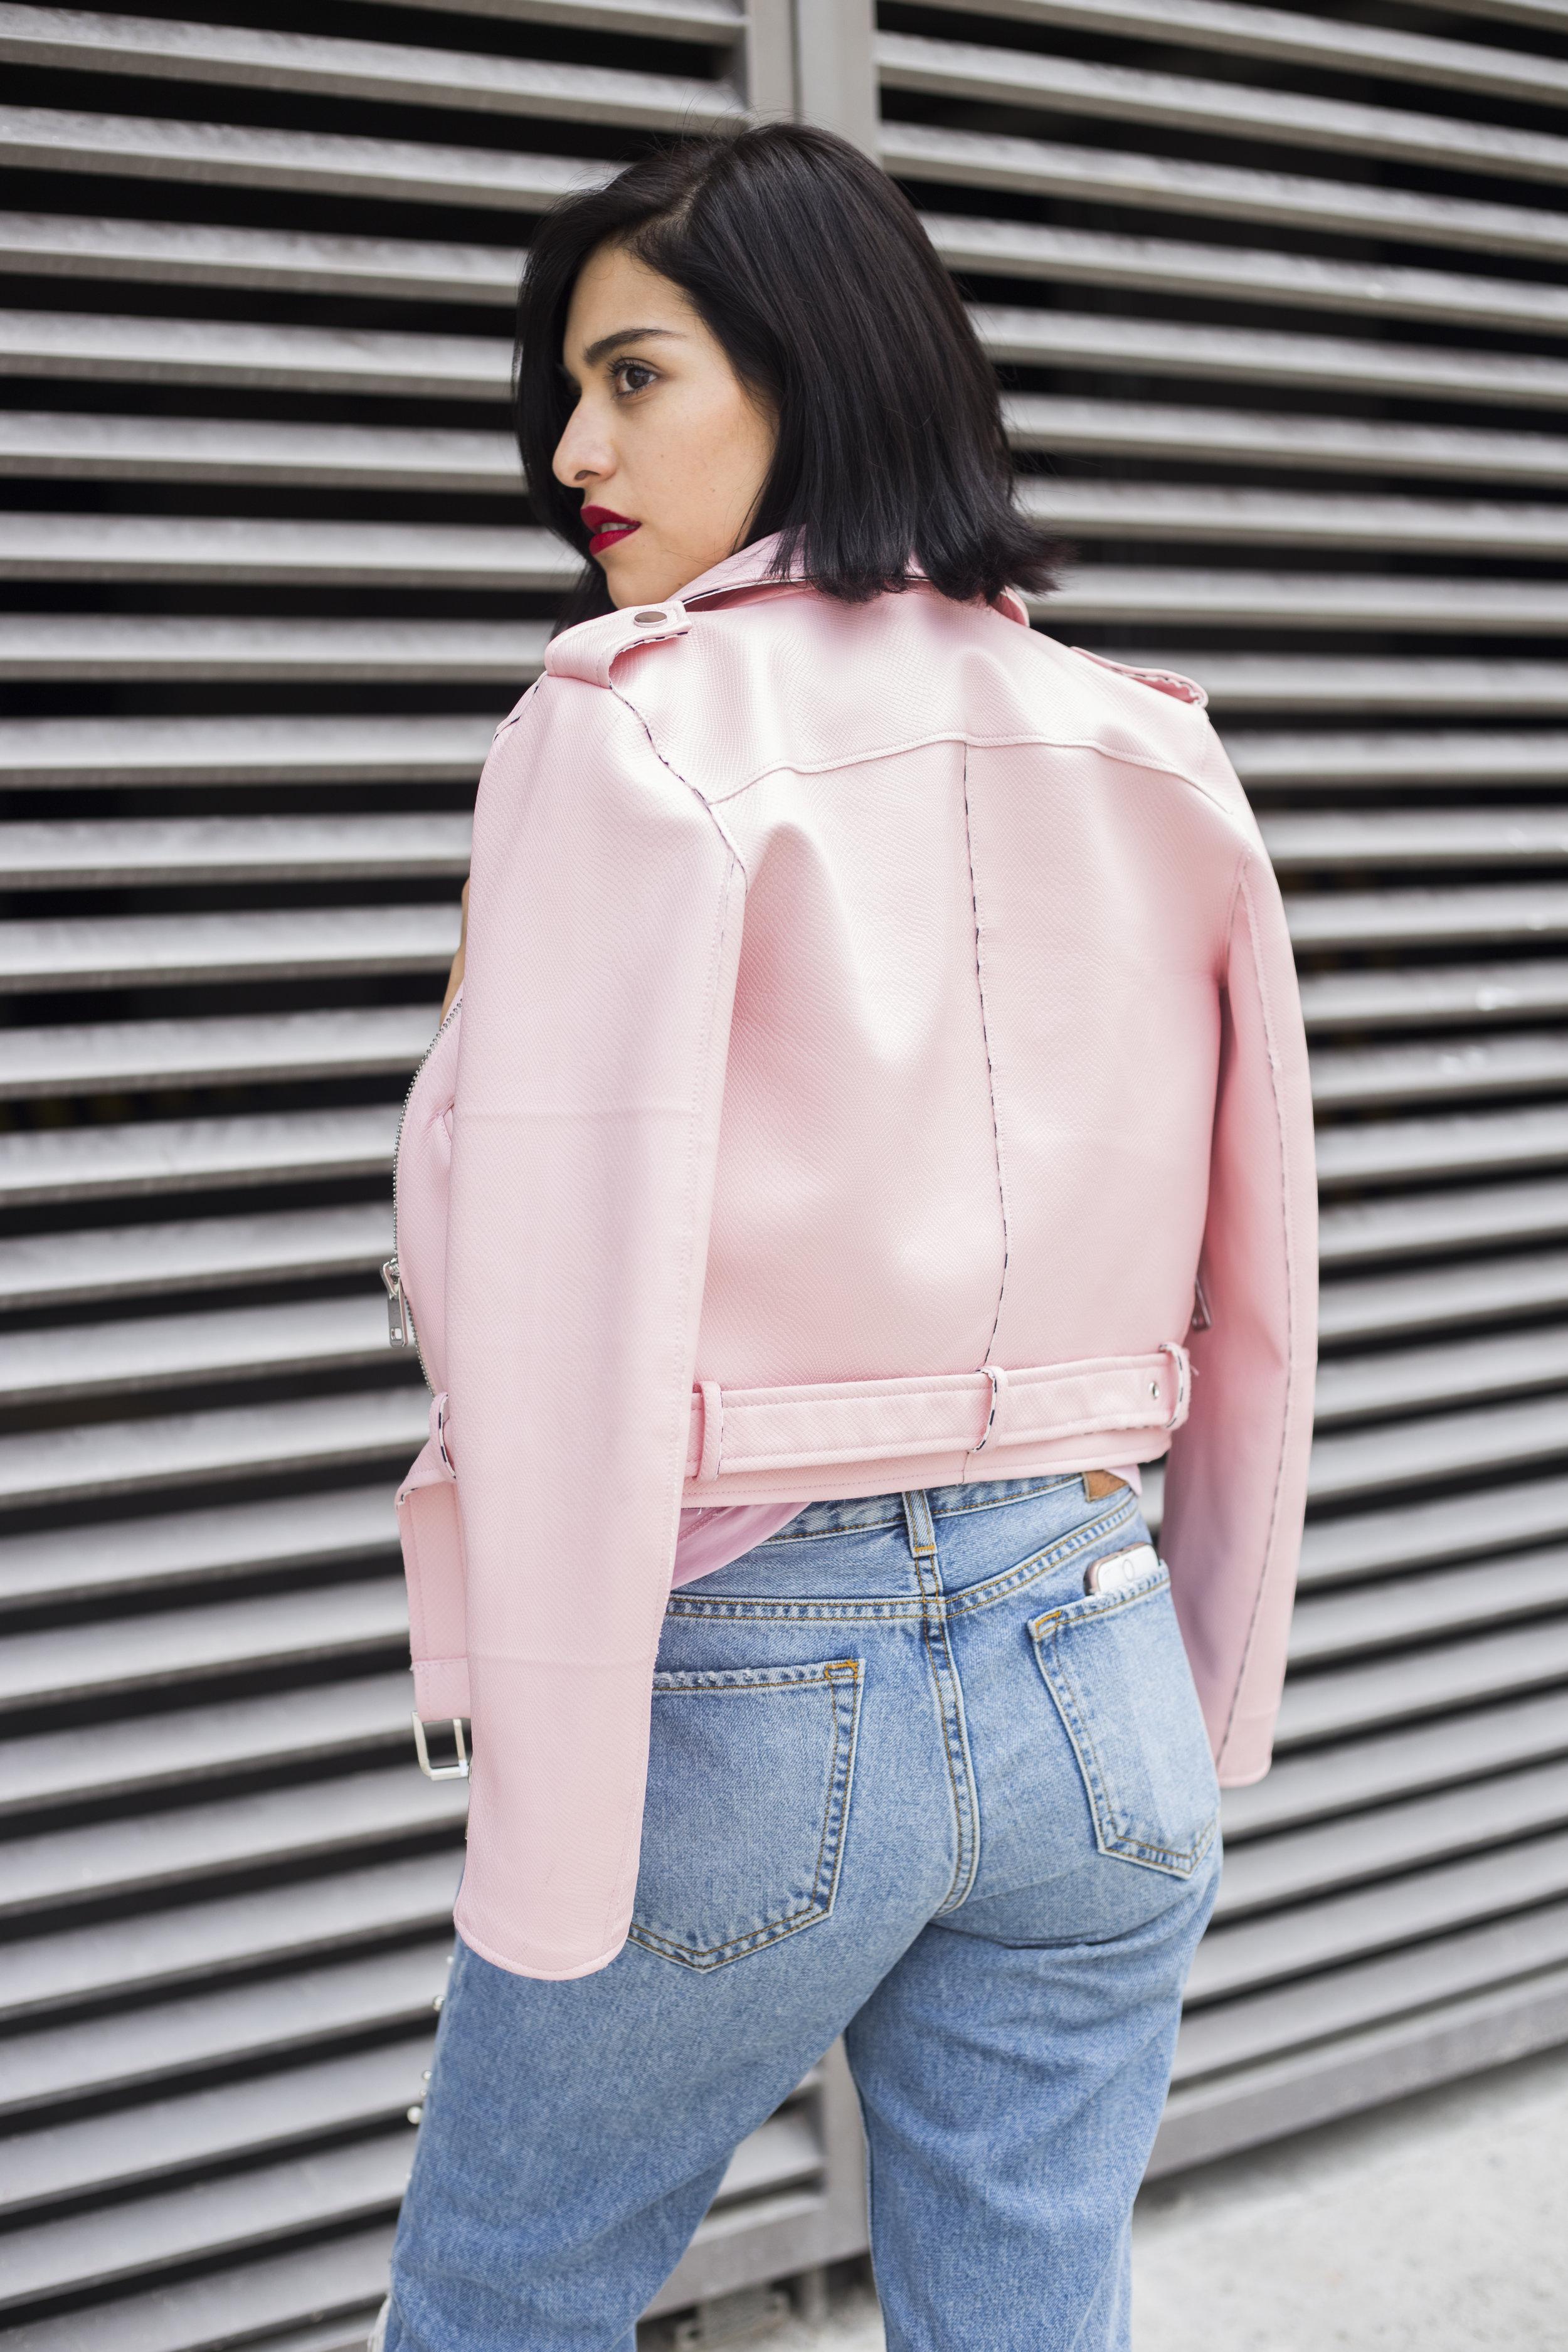 Jeans: Zara